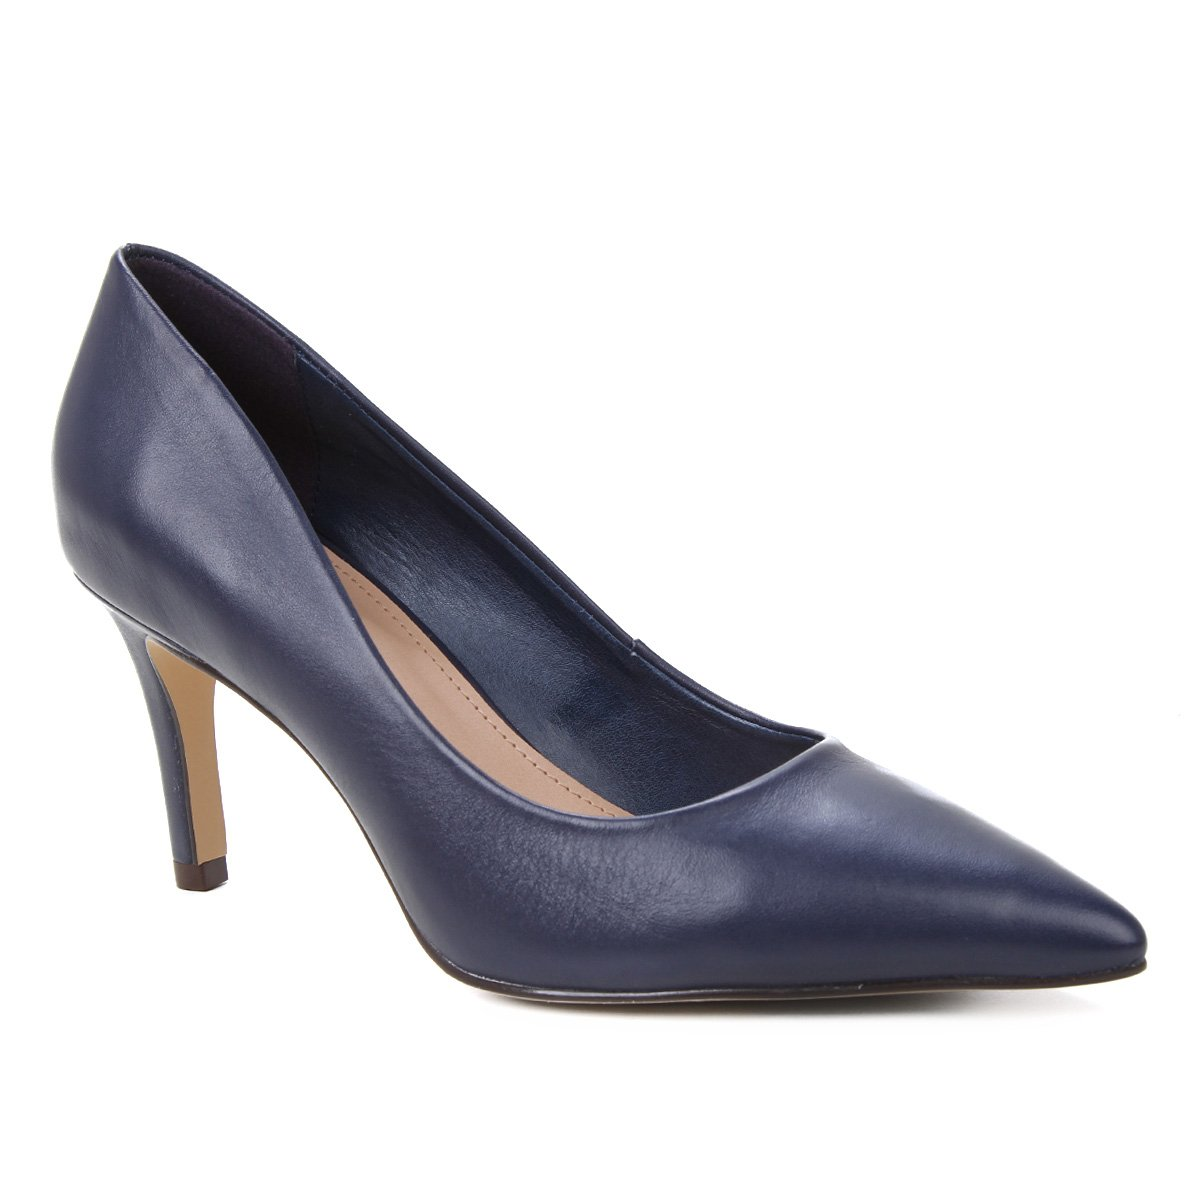 Scarpin Couro Shoestock Liso Salto Médio